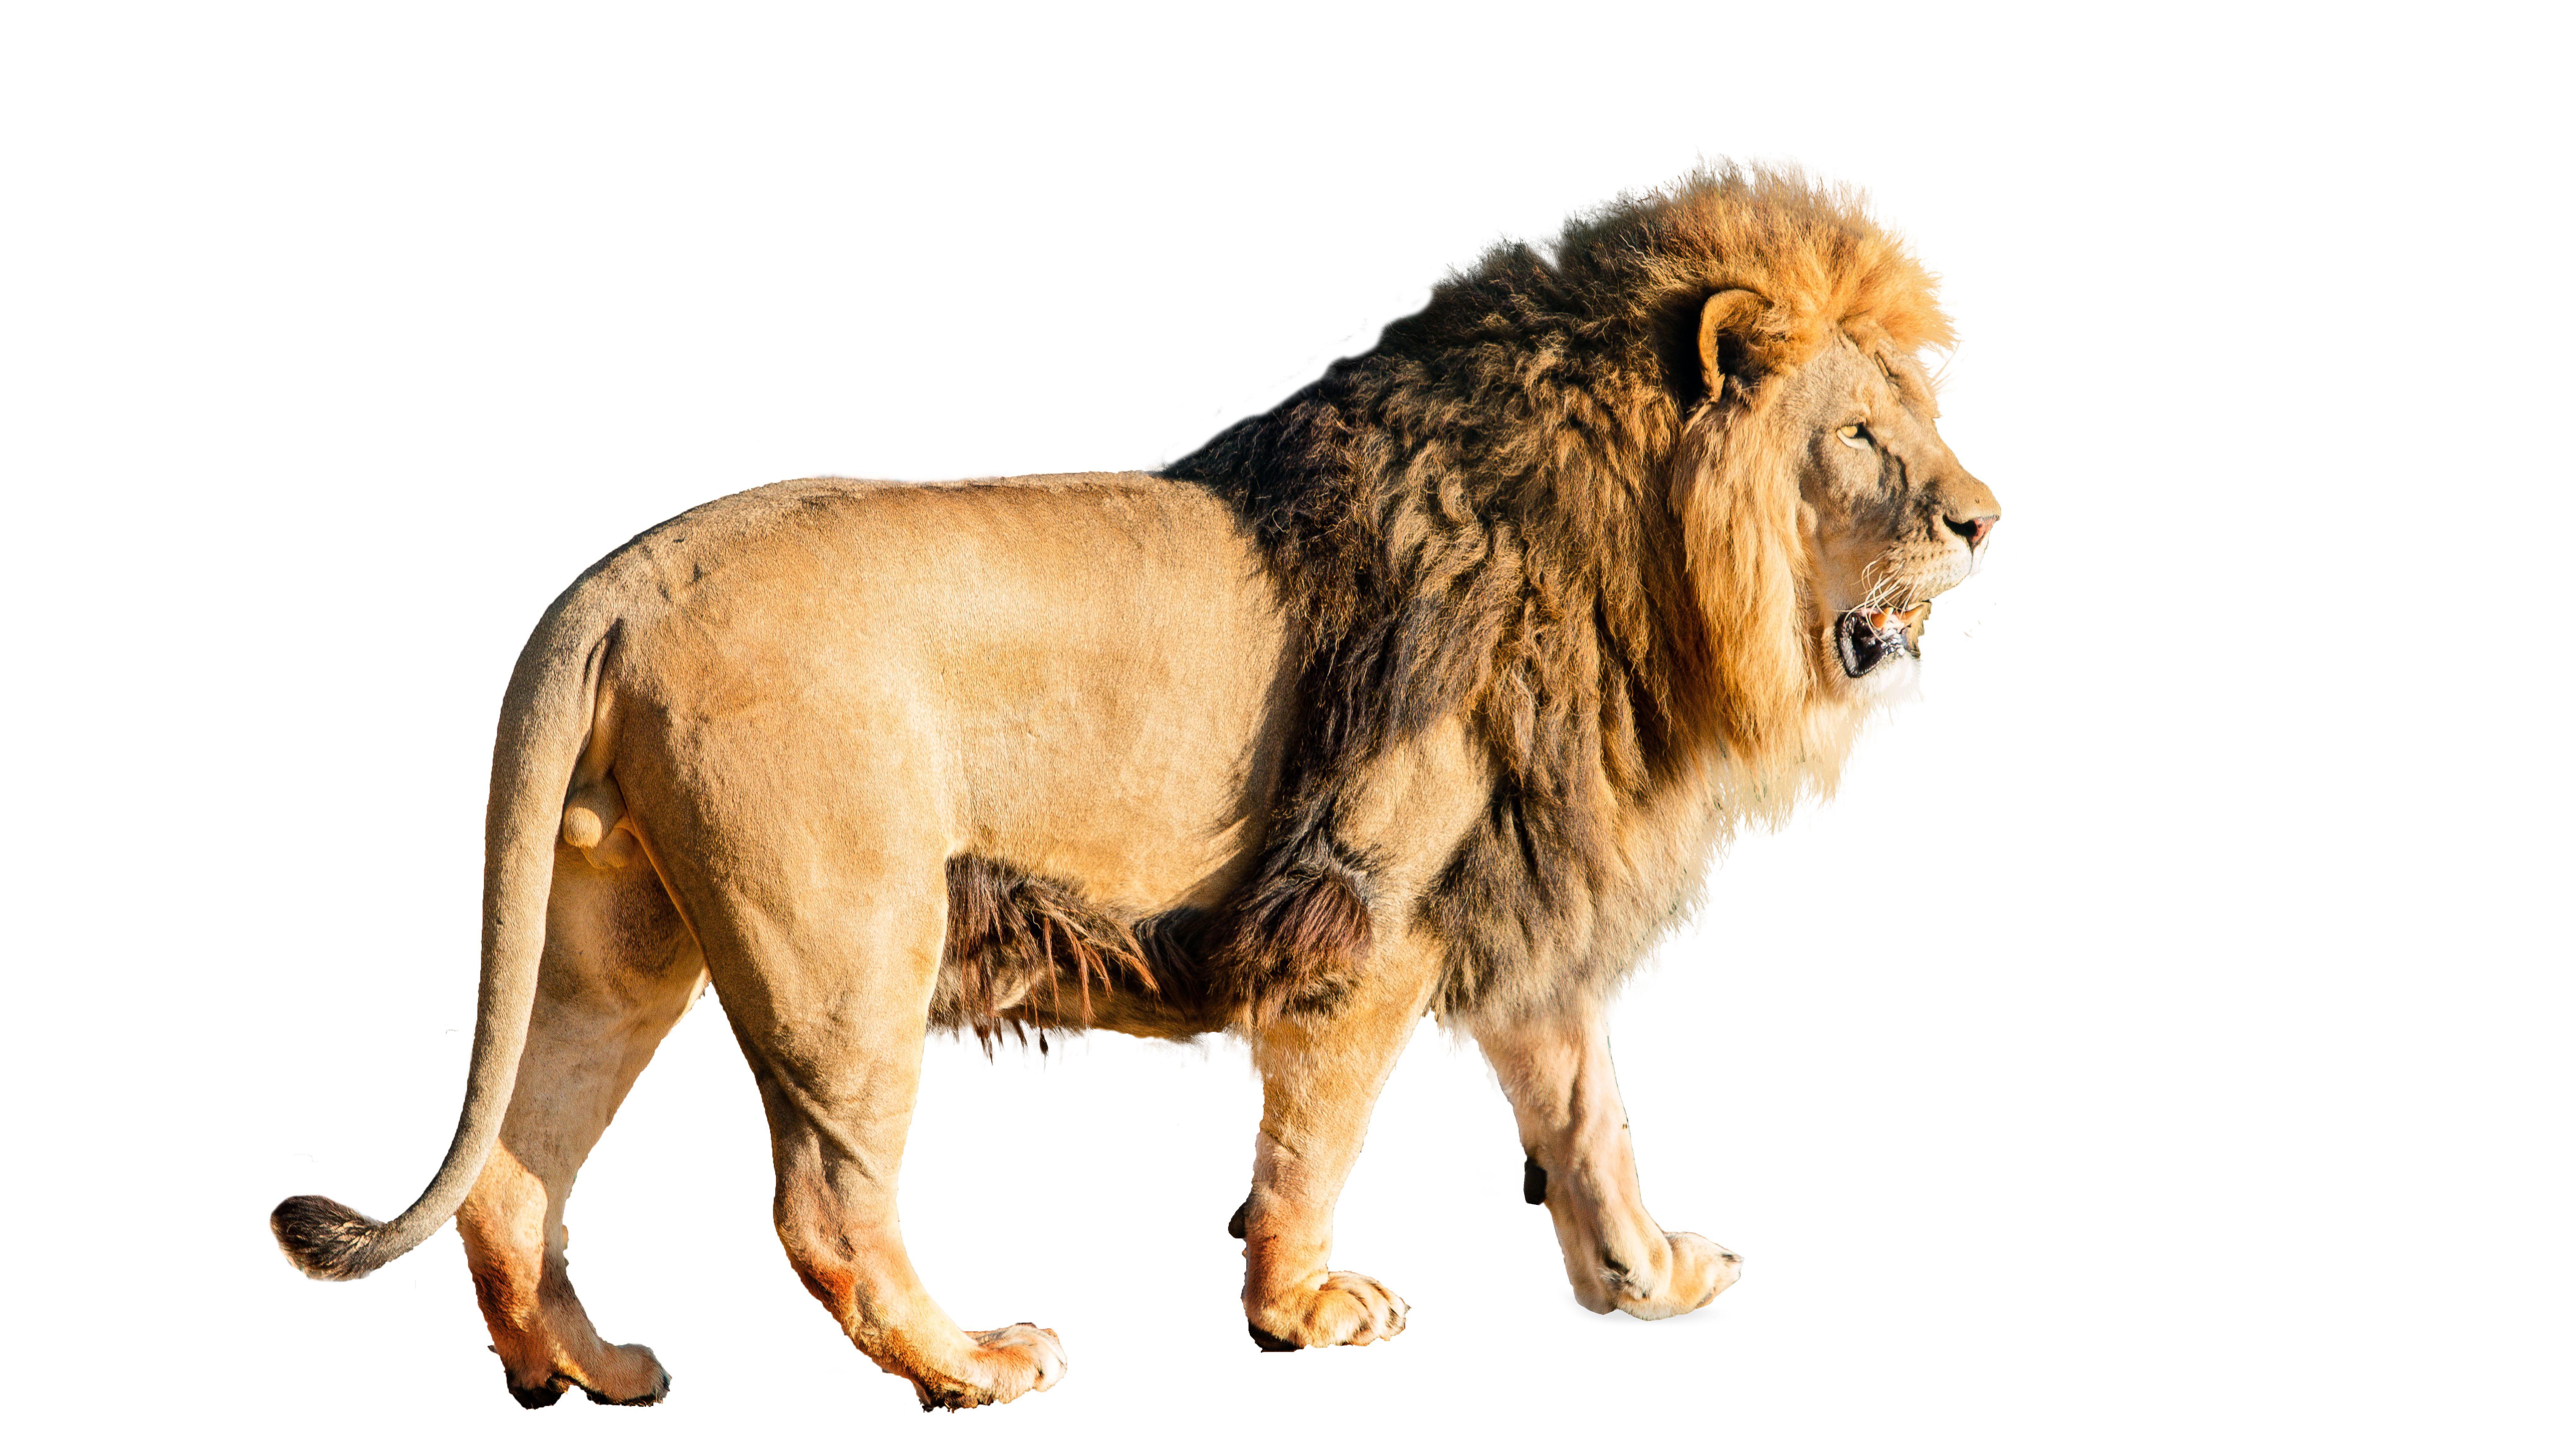 African Lion Facts: Habitat, Diet, Behavior